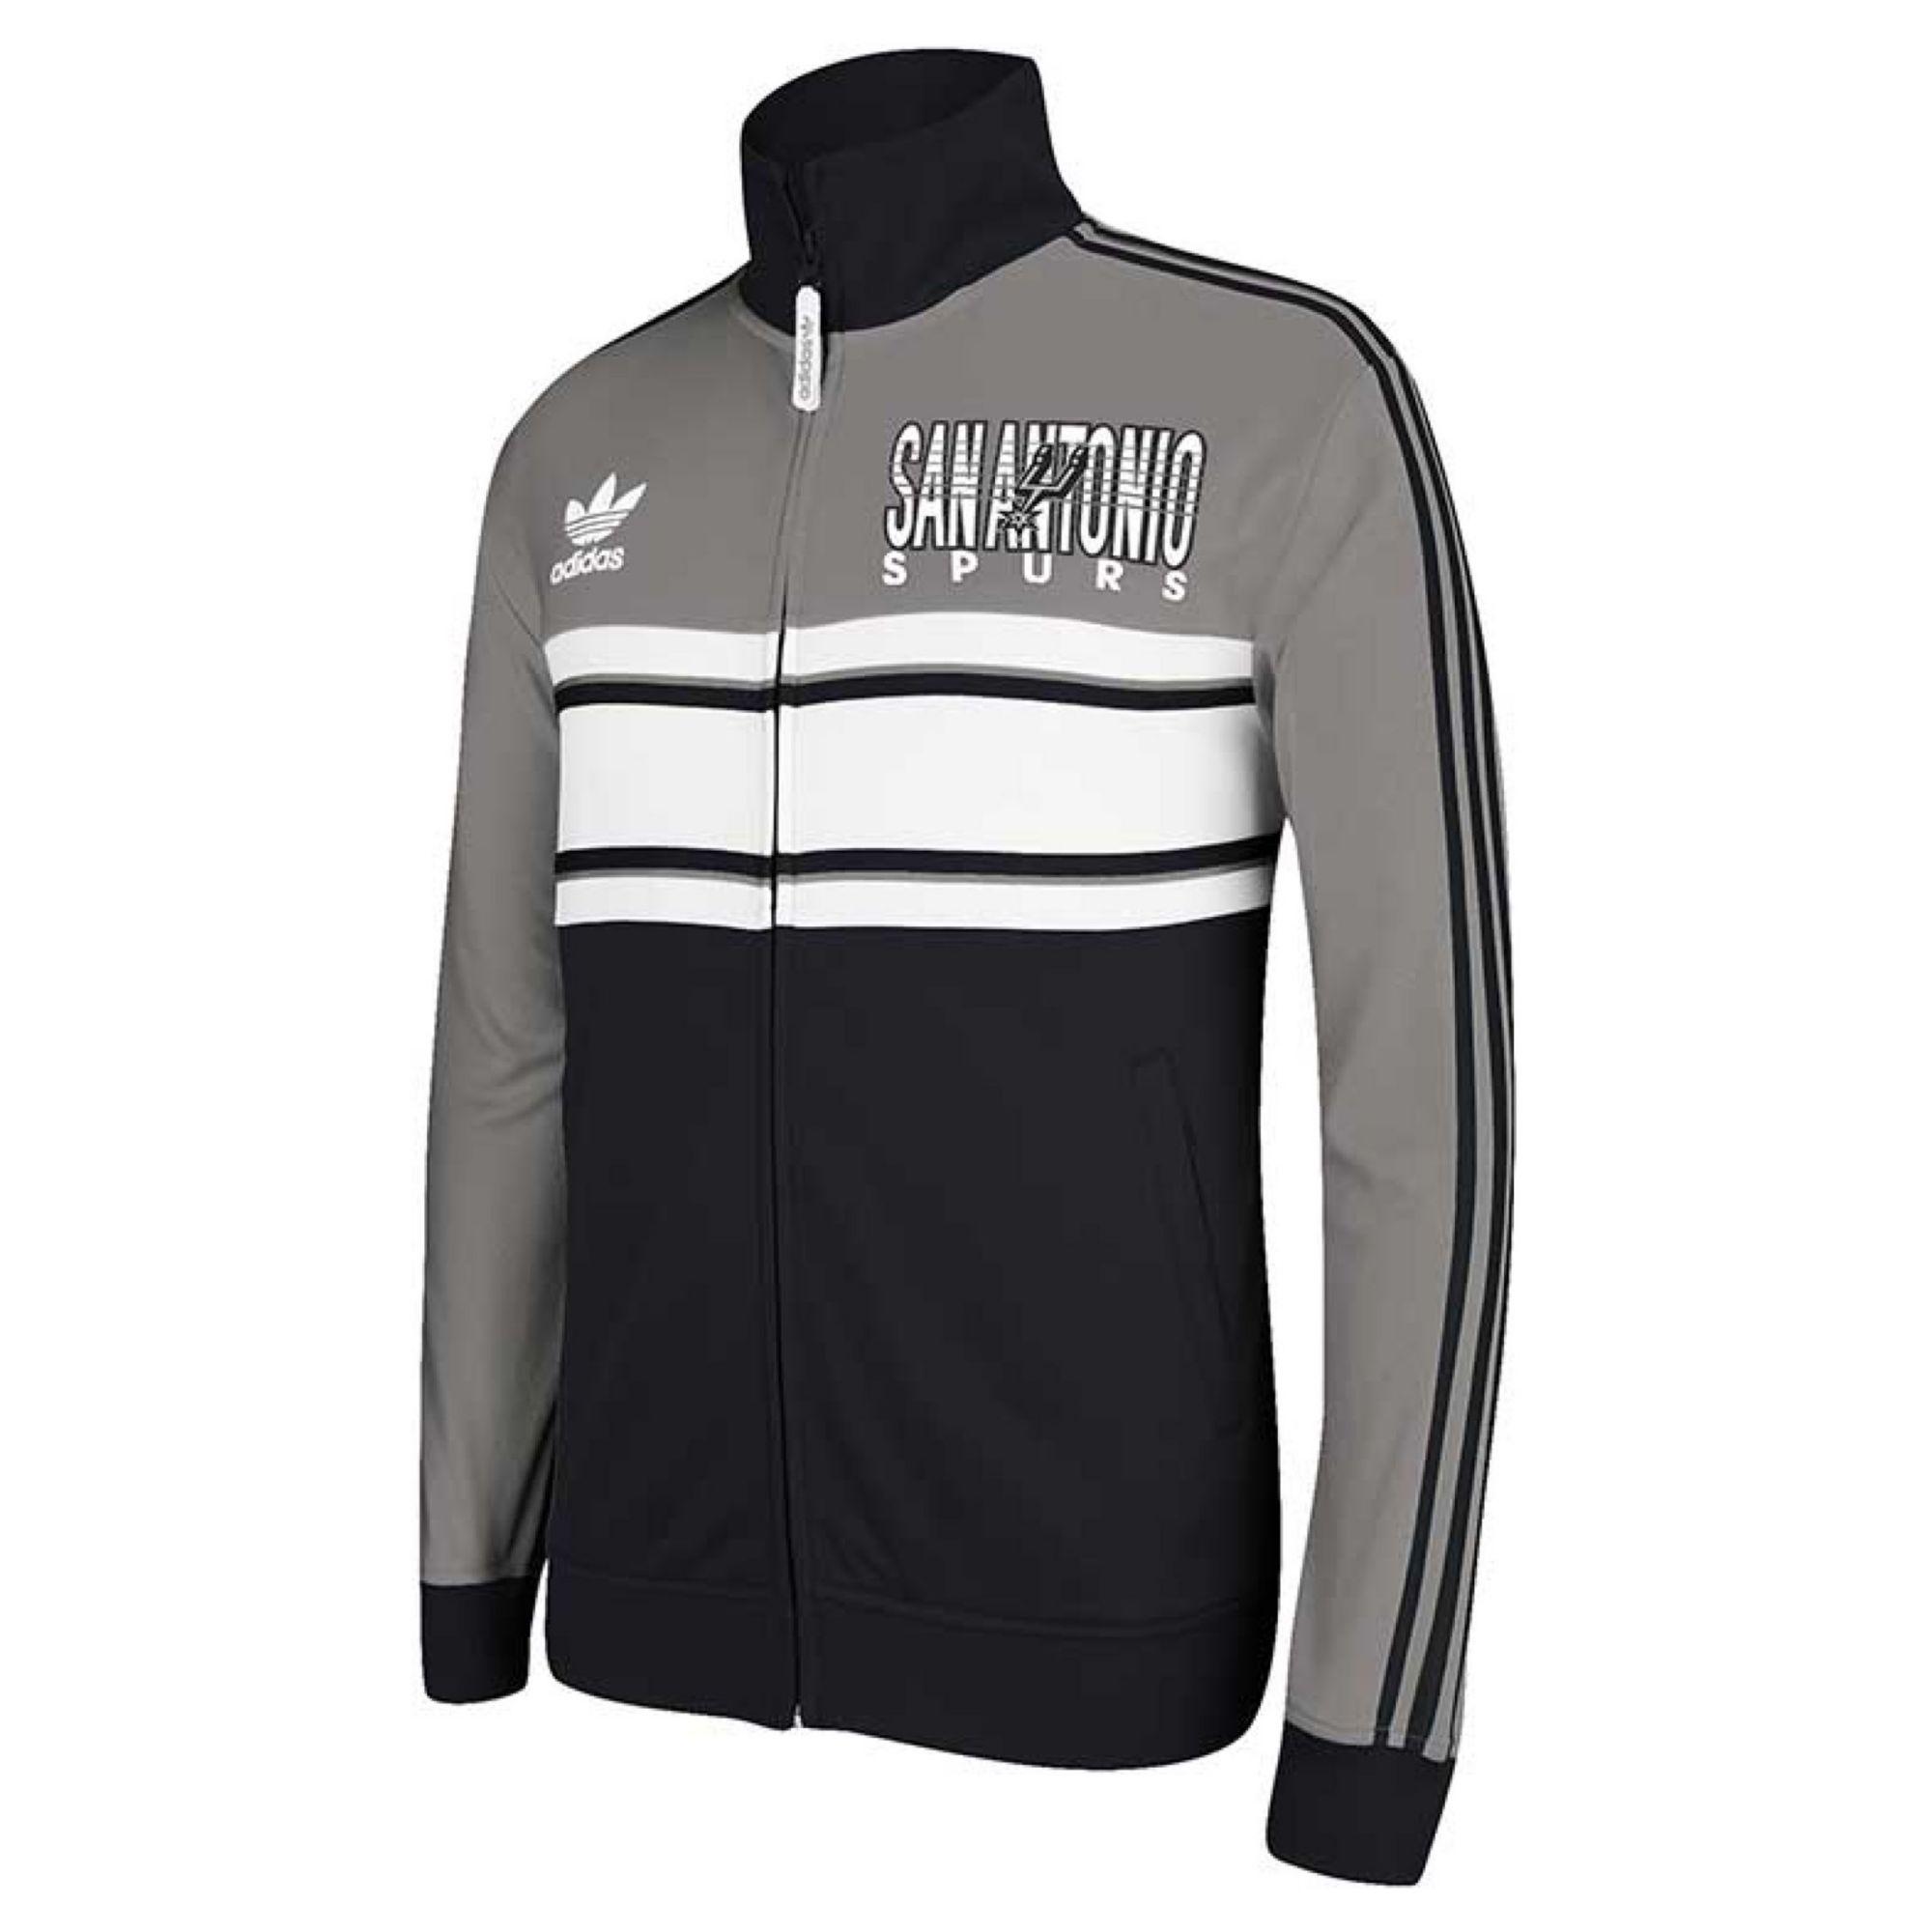 1e6c41cf5 Lyst - adidas Men S San Antonio Spurs Full-Zip Track Jacket in Black ...